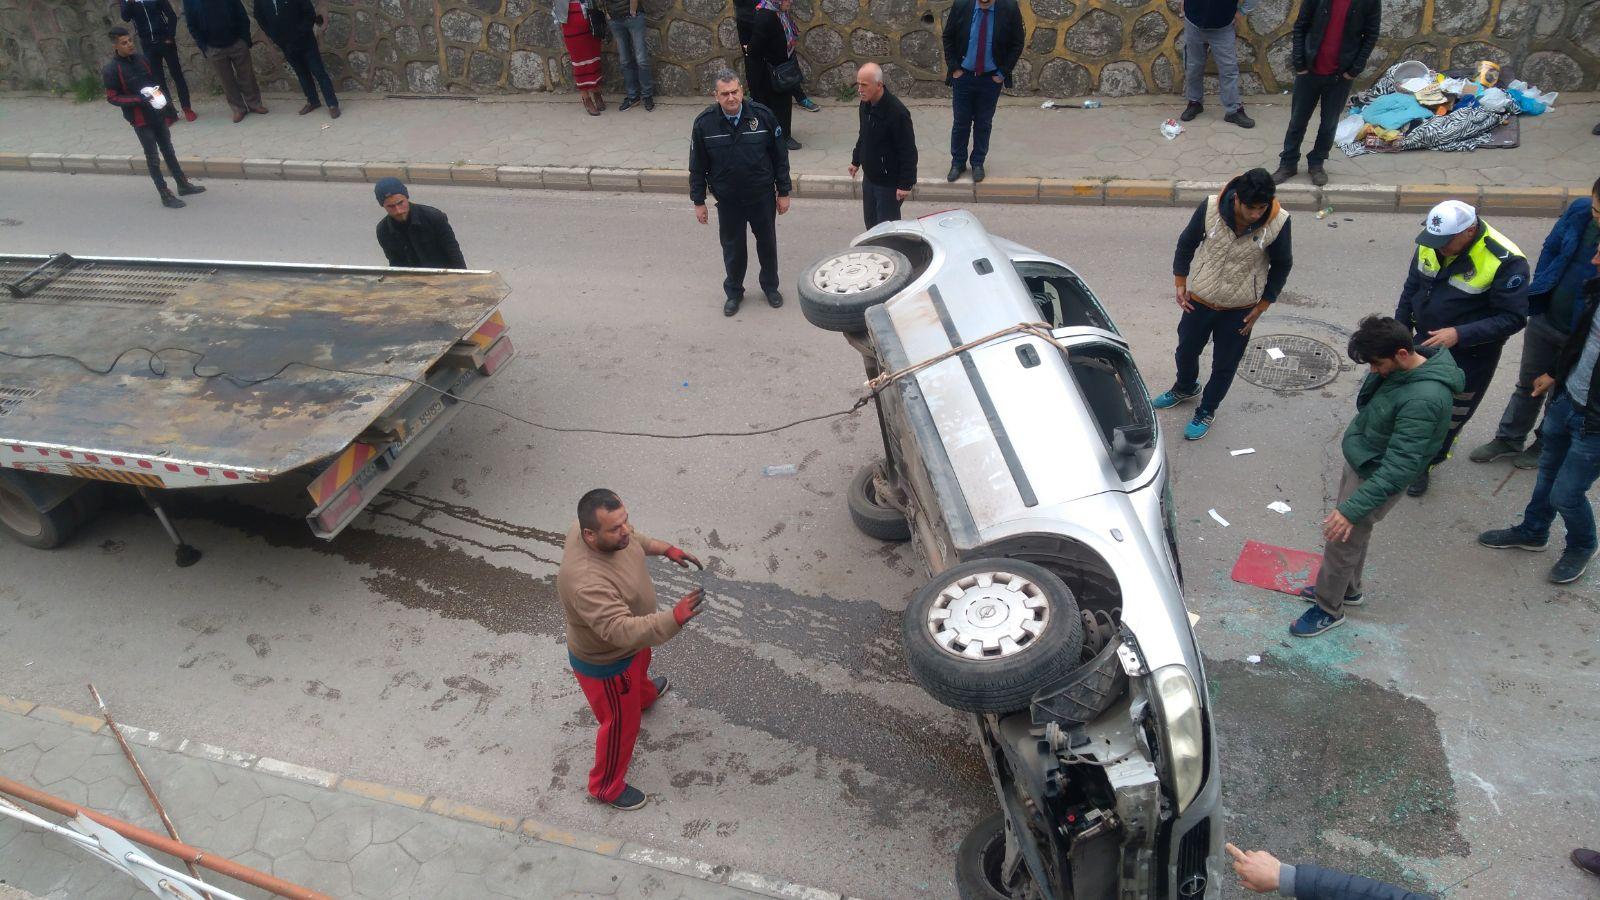 Otomobil yola düştü: 1 yaralı